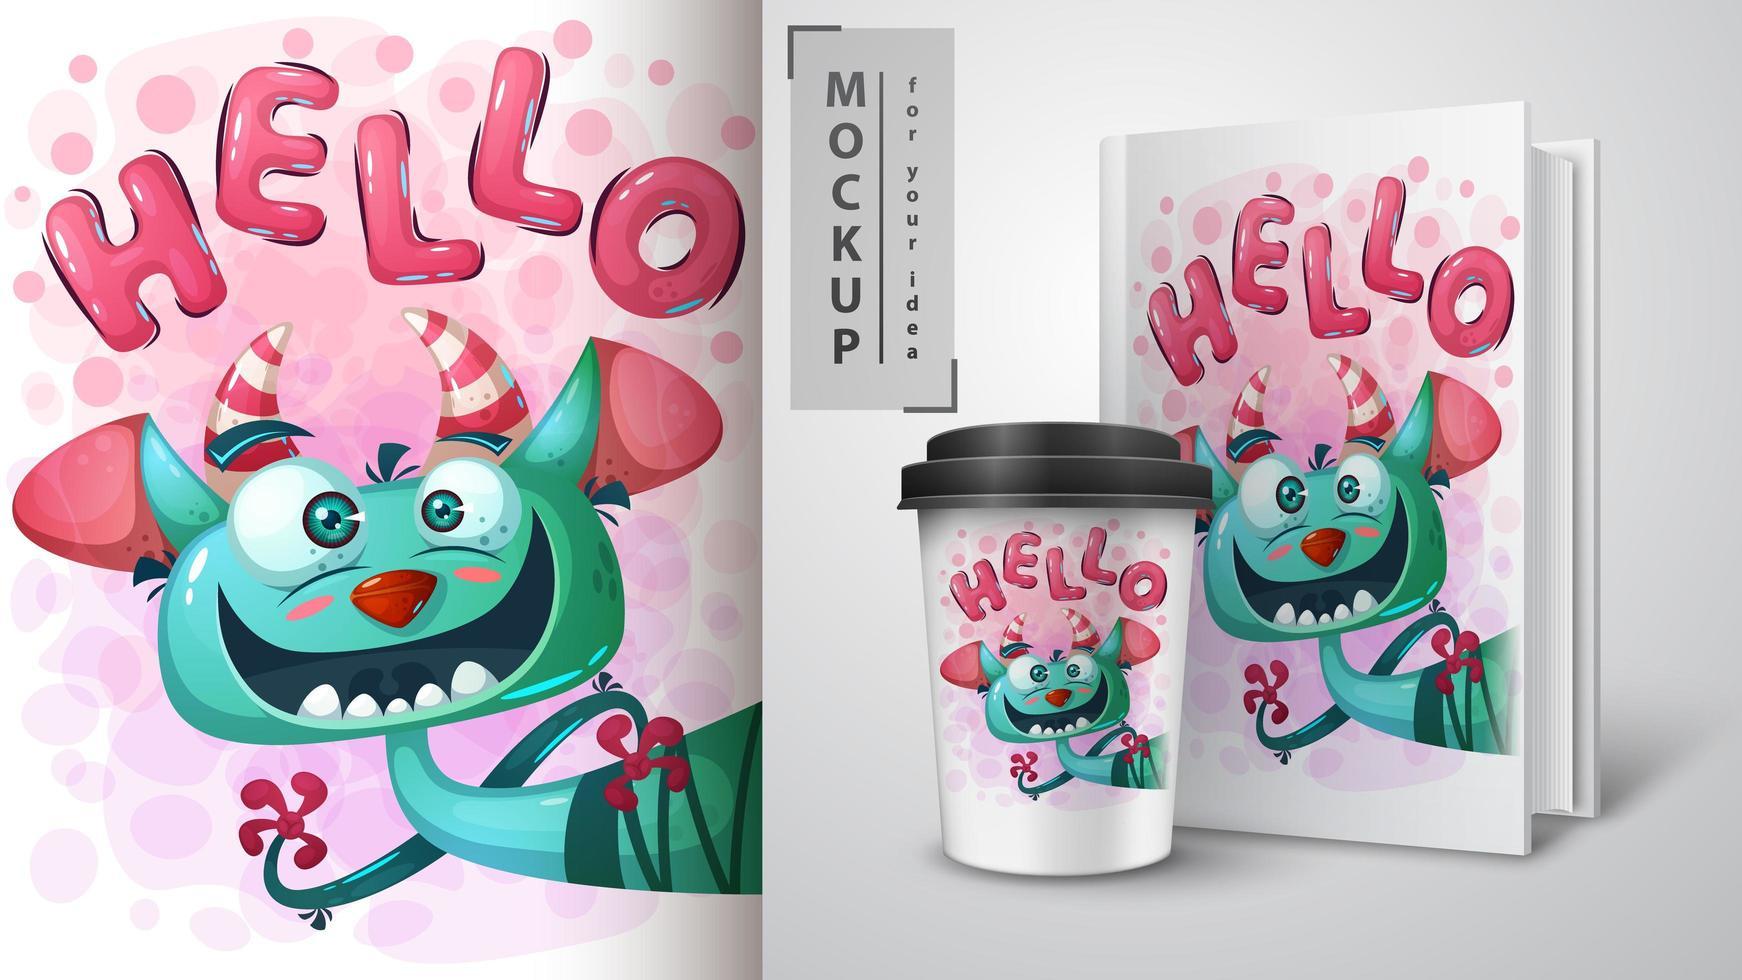 Hello monster poster  vector